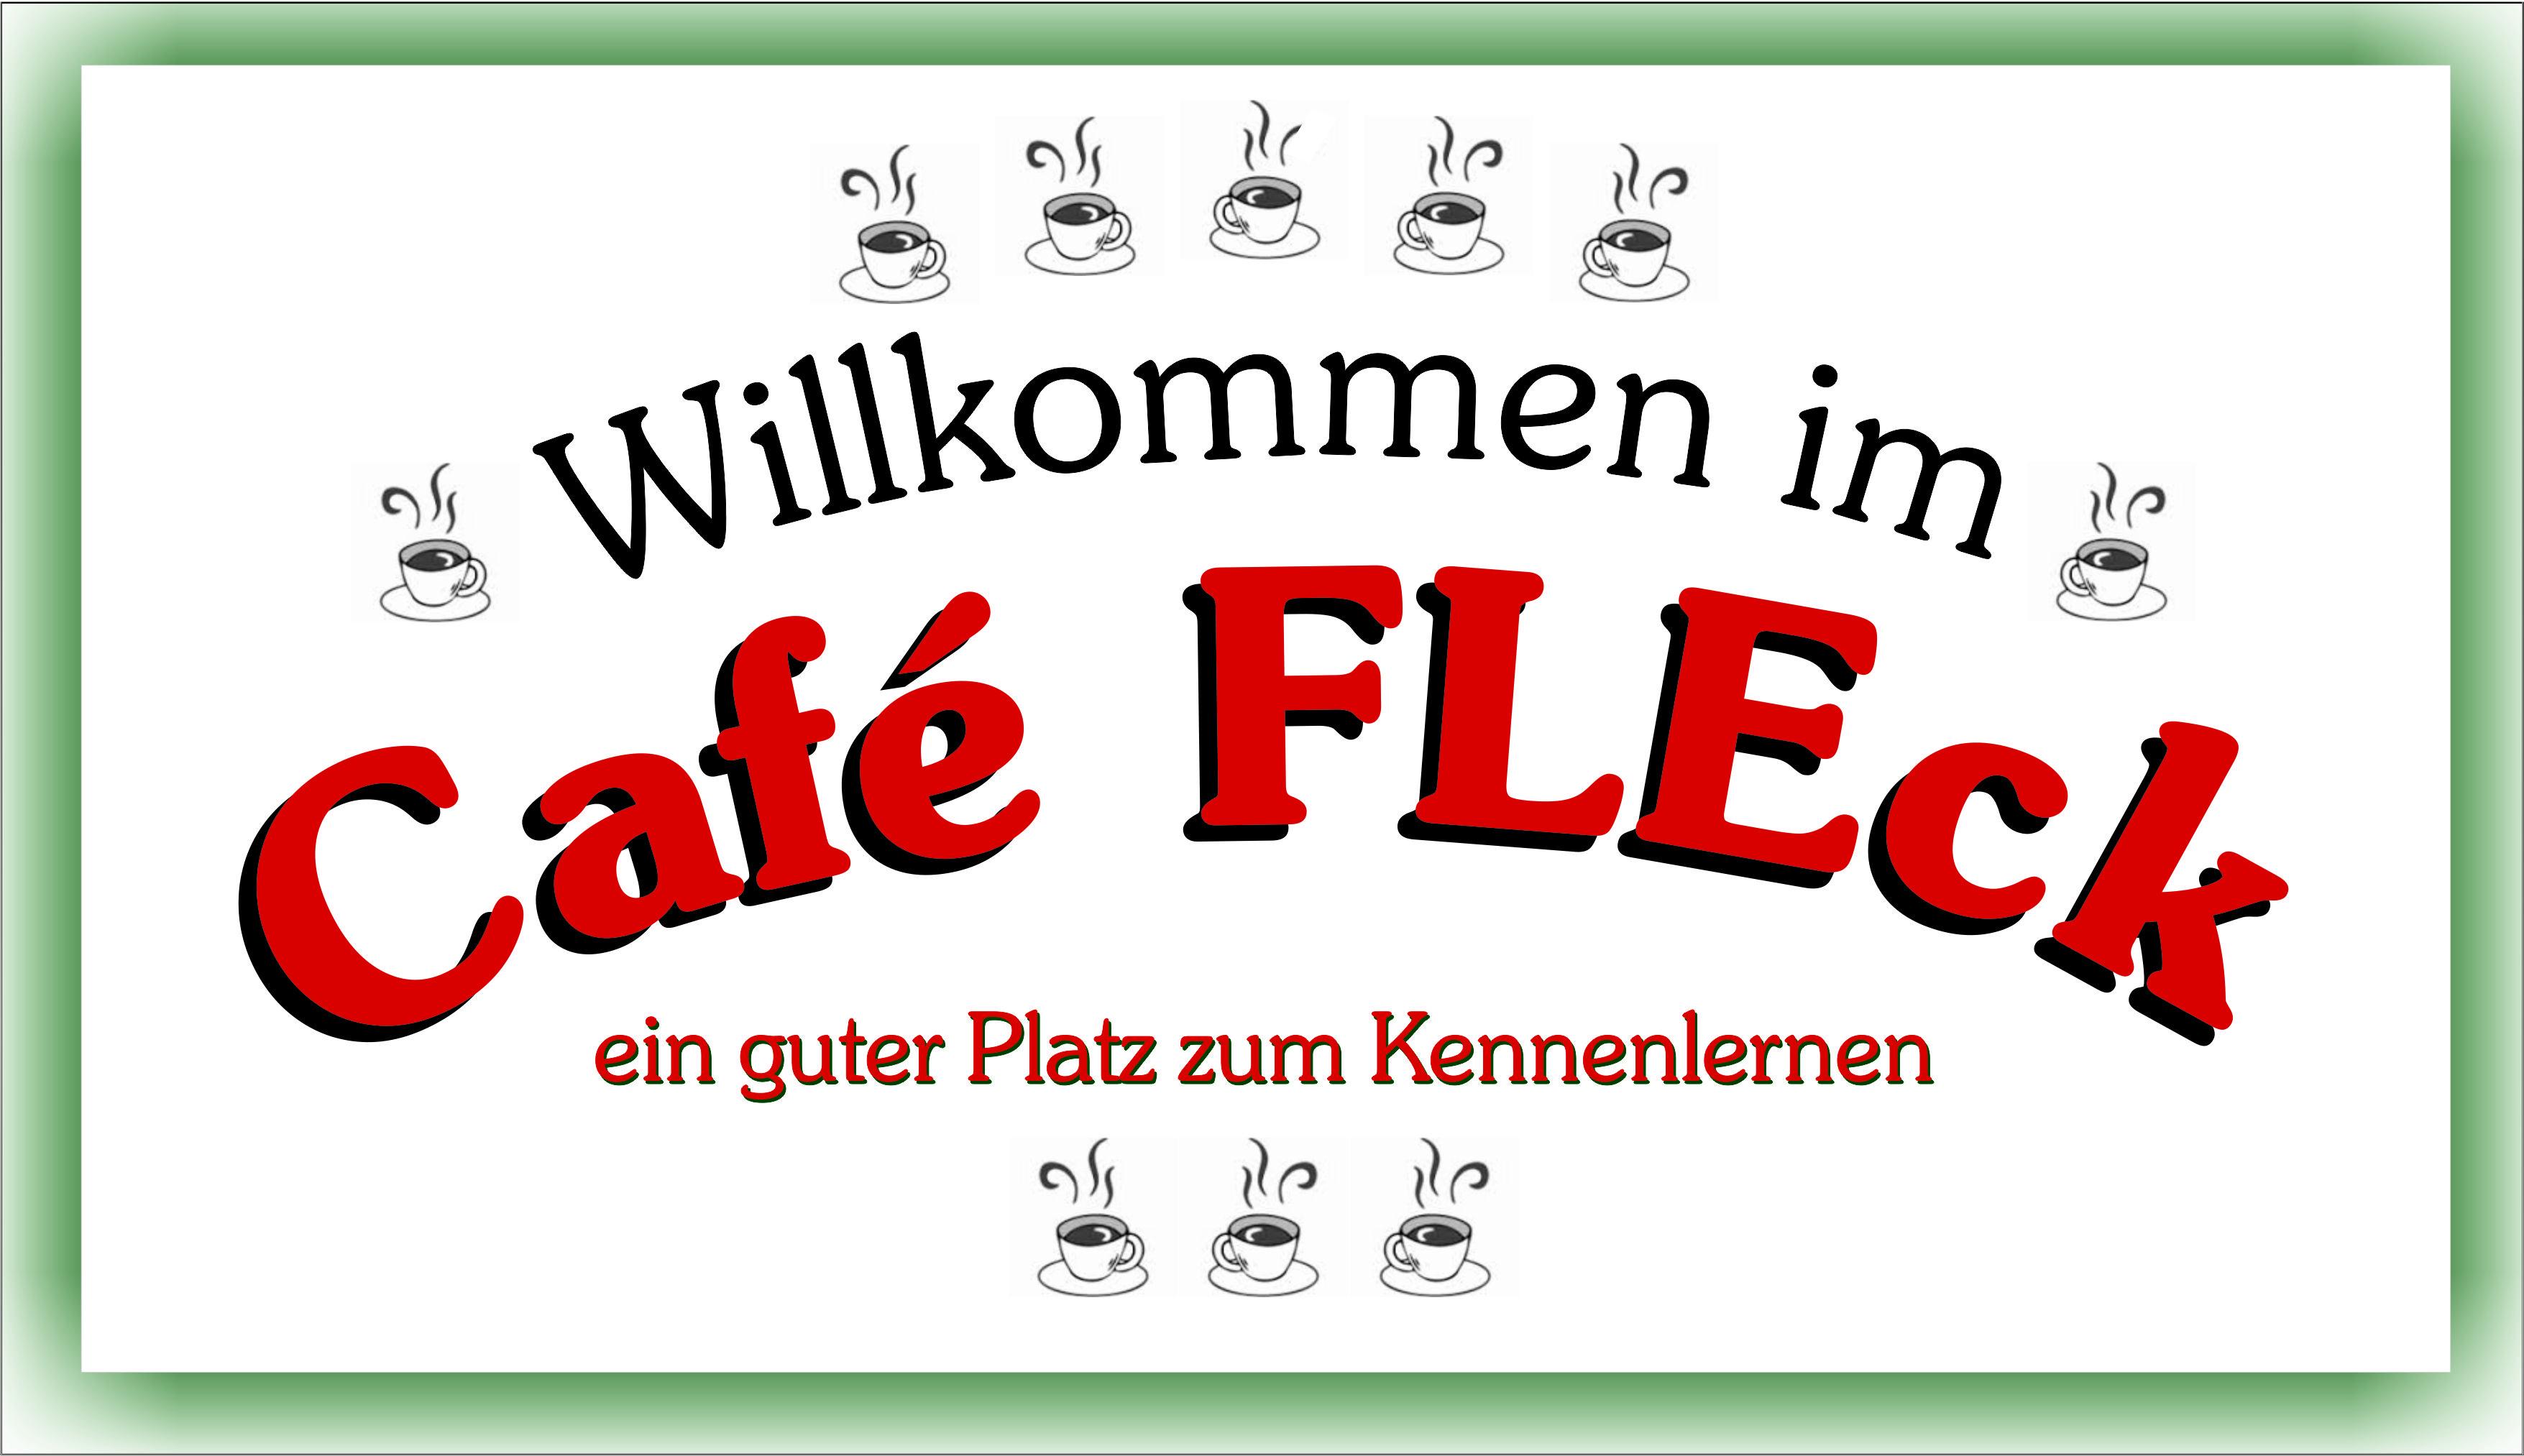 cafés und treffpunkte – flüchtlingsinitiative eckental fleck e.v., Einladung